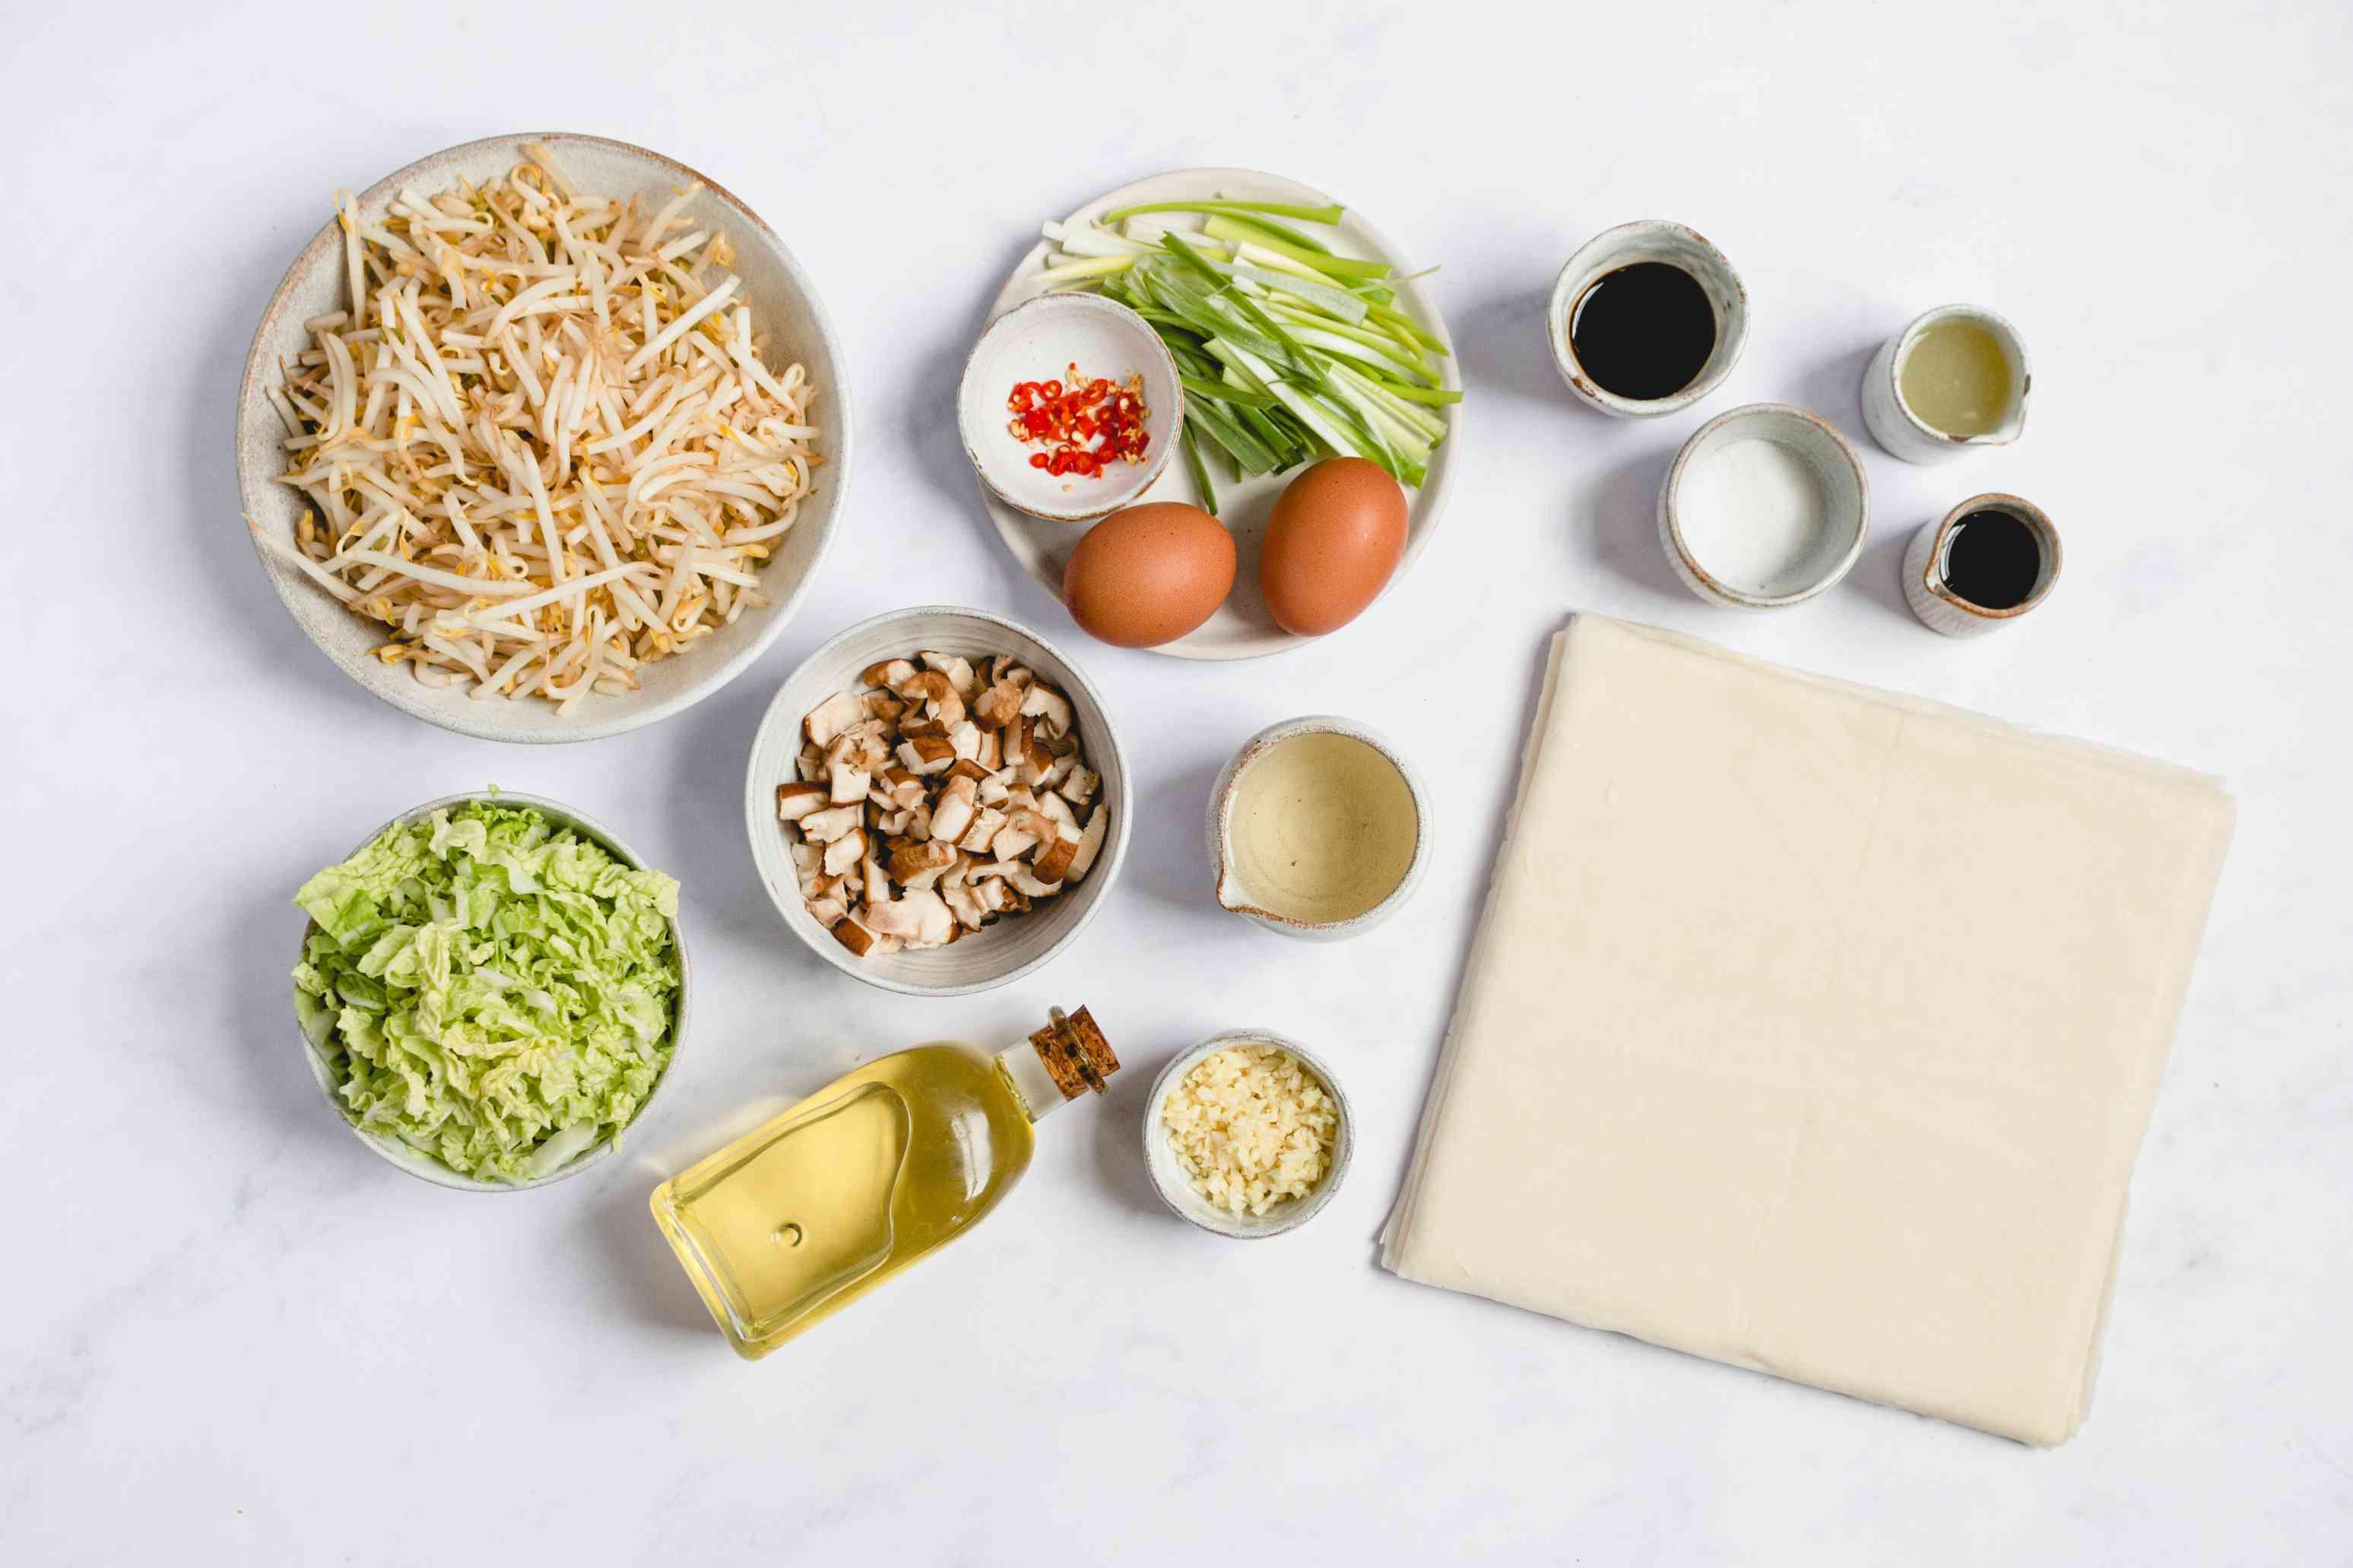 Thai Vegetarian Egg Rolls ingredients